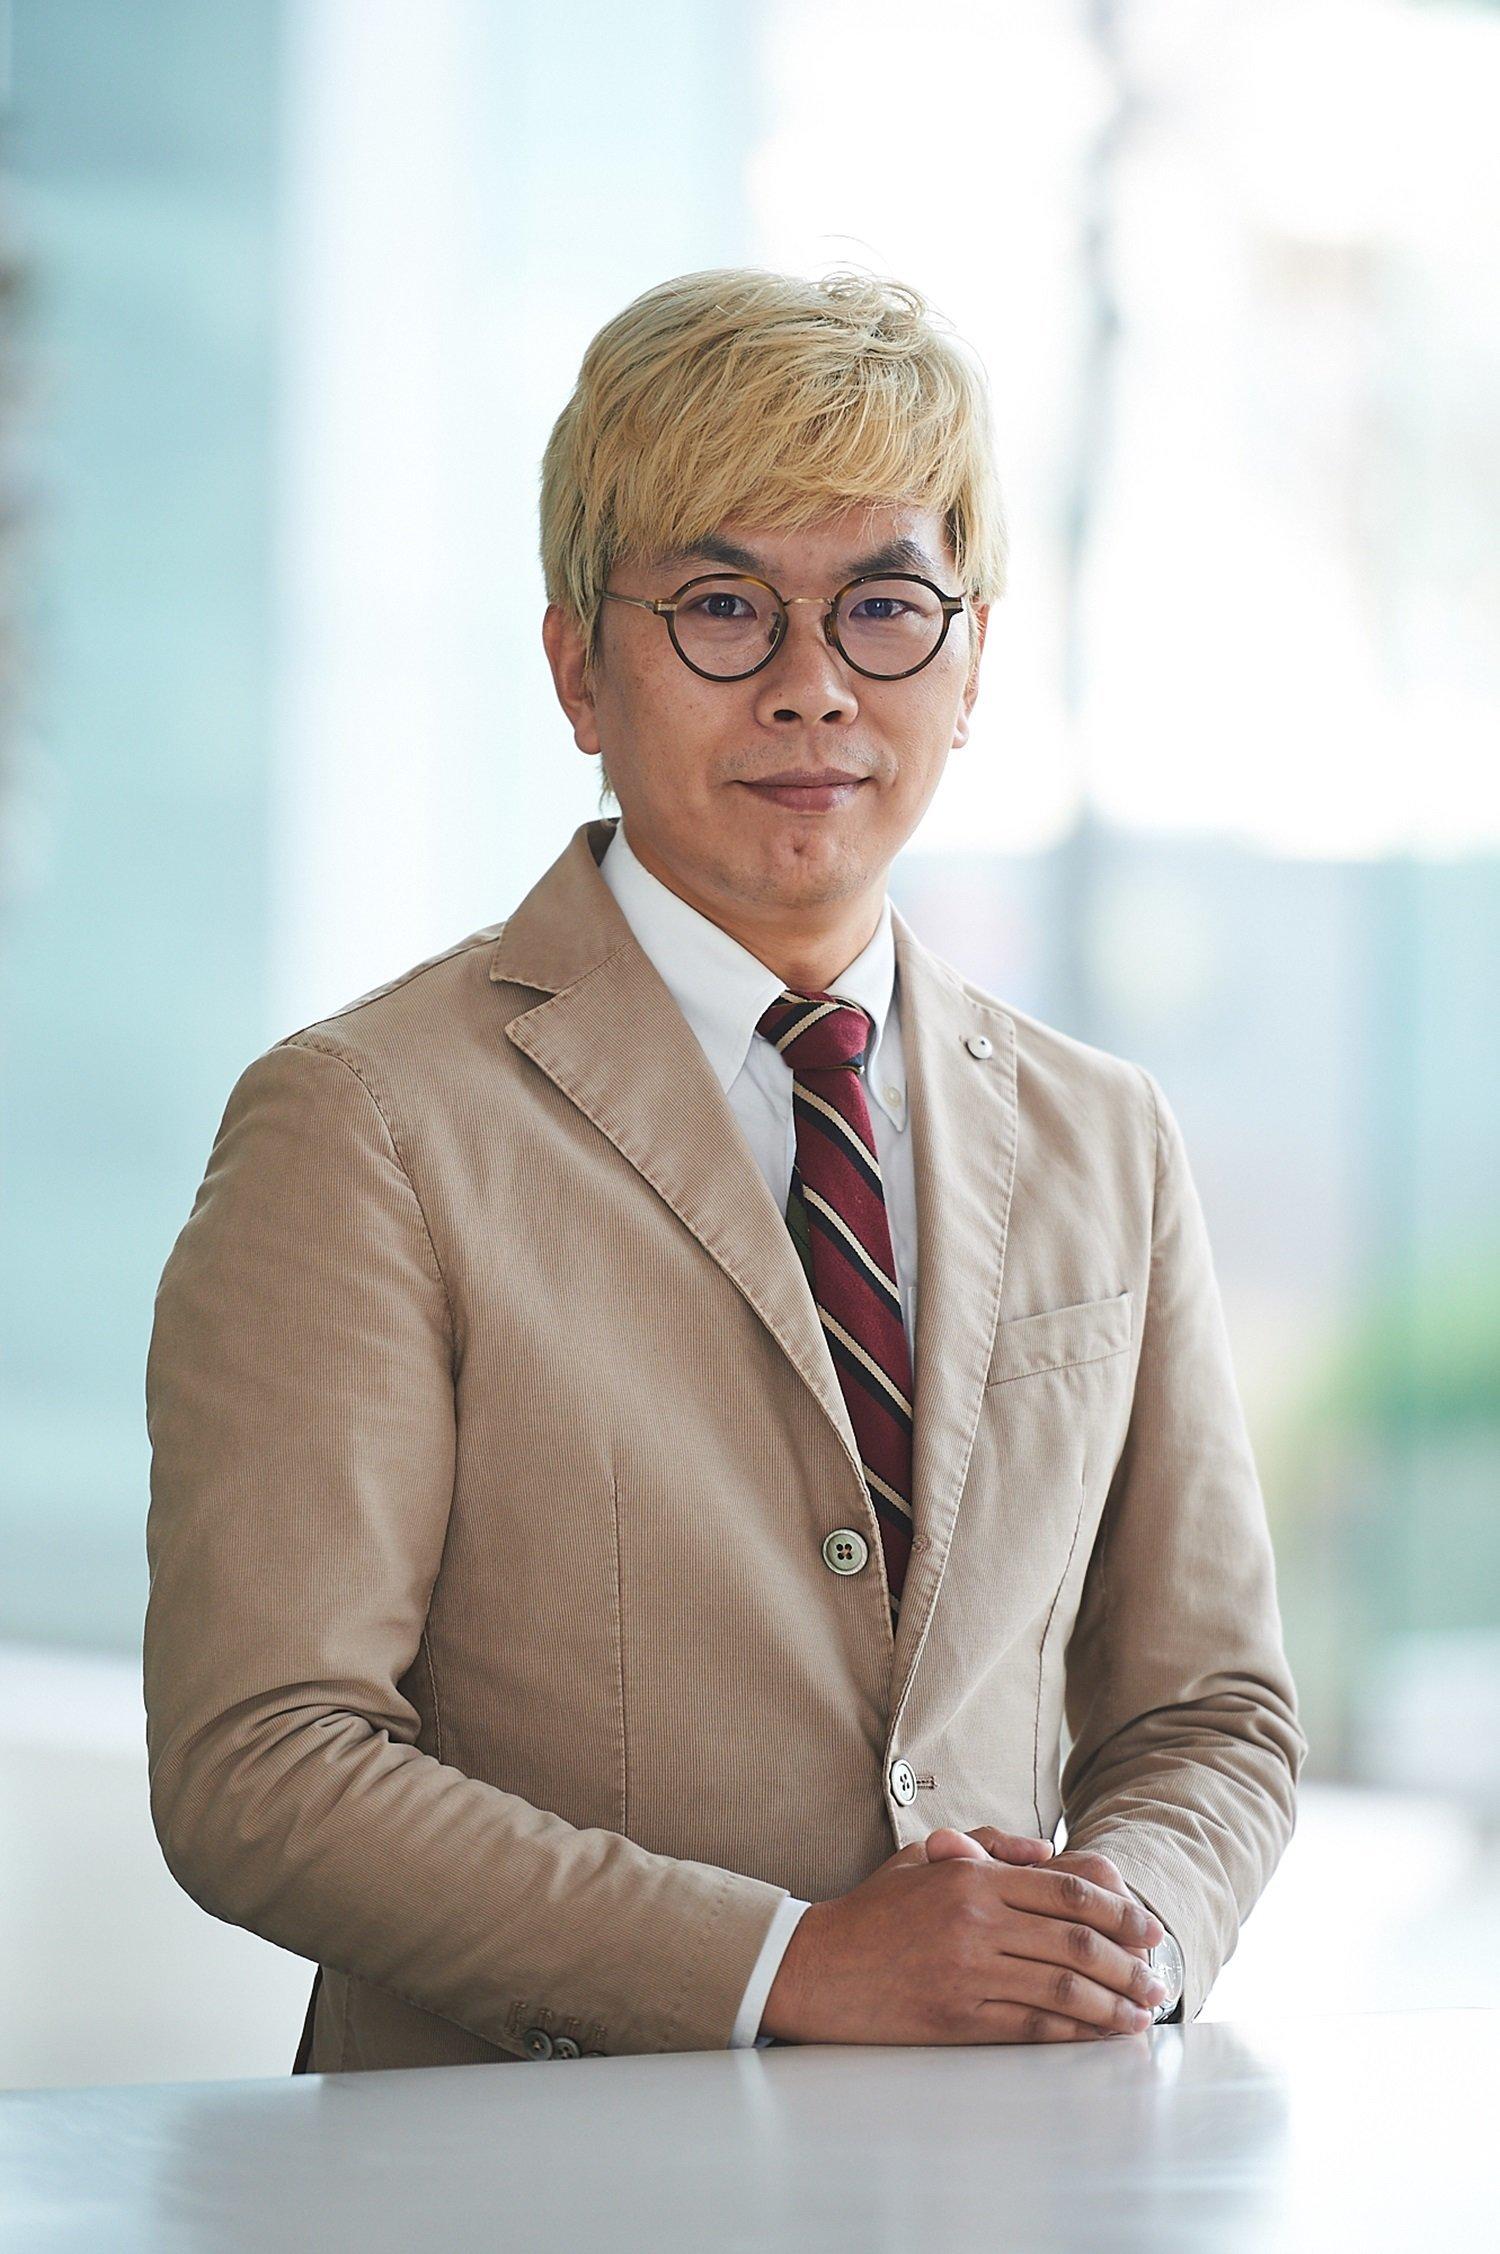 MBC가 '김태호 PD 복귀설'에 밝힌